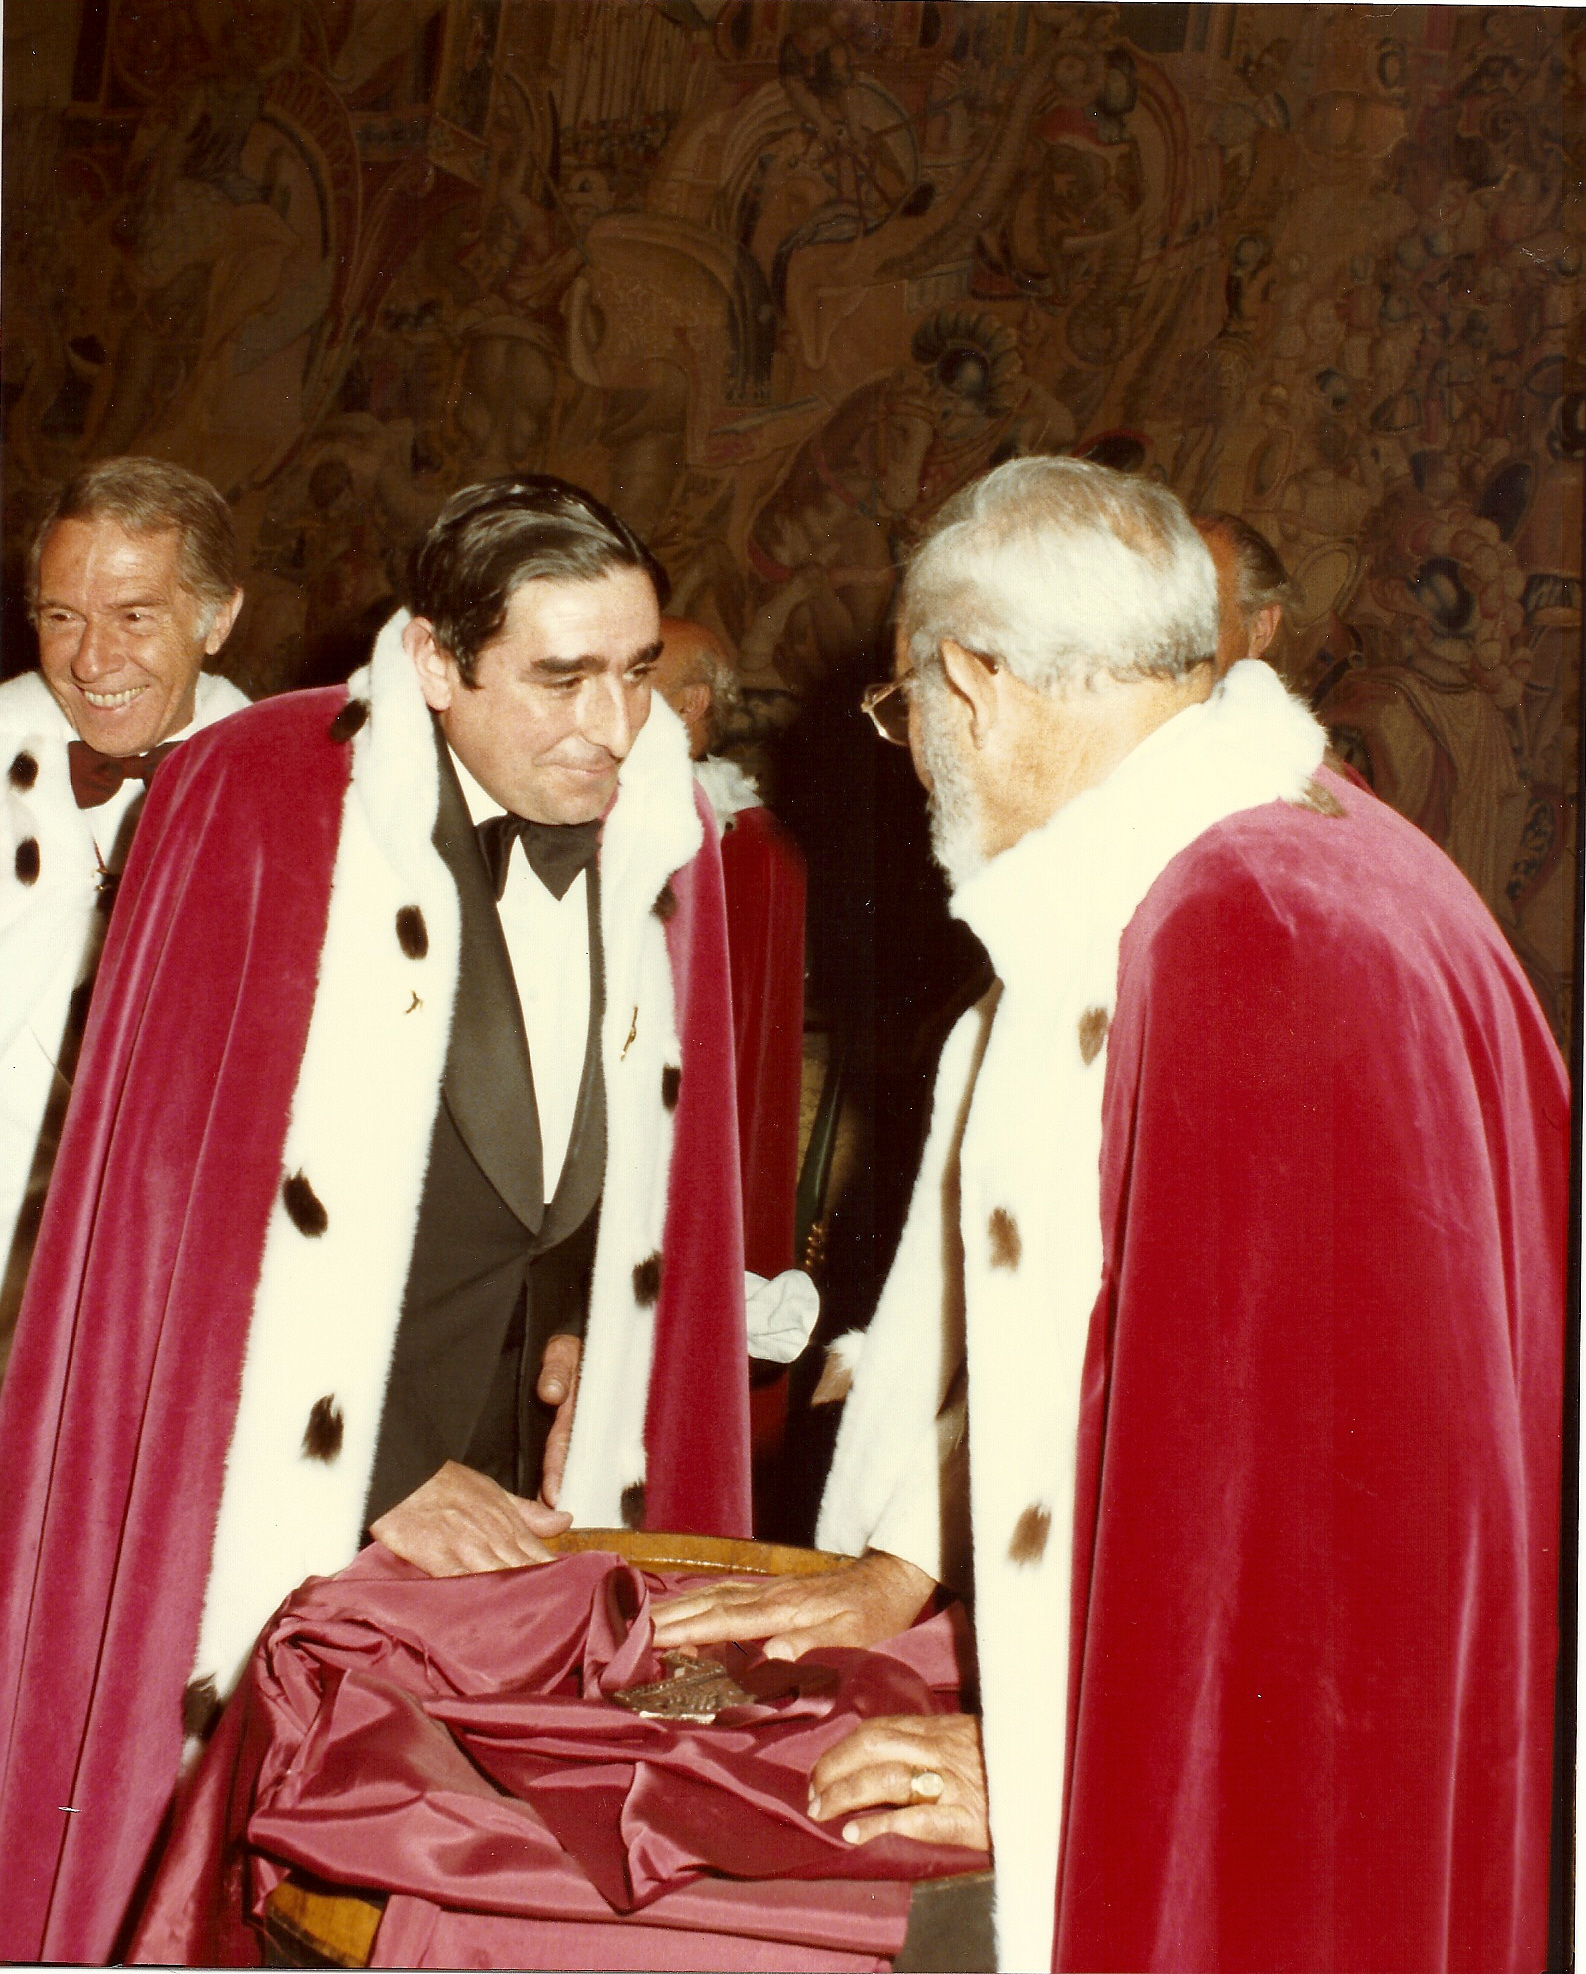 Entrega a Don Eugenio Cuerdo de la Insignia de Serenisimo Capitulo de Caballeros del Vino (1983)